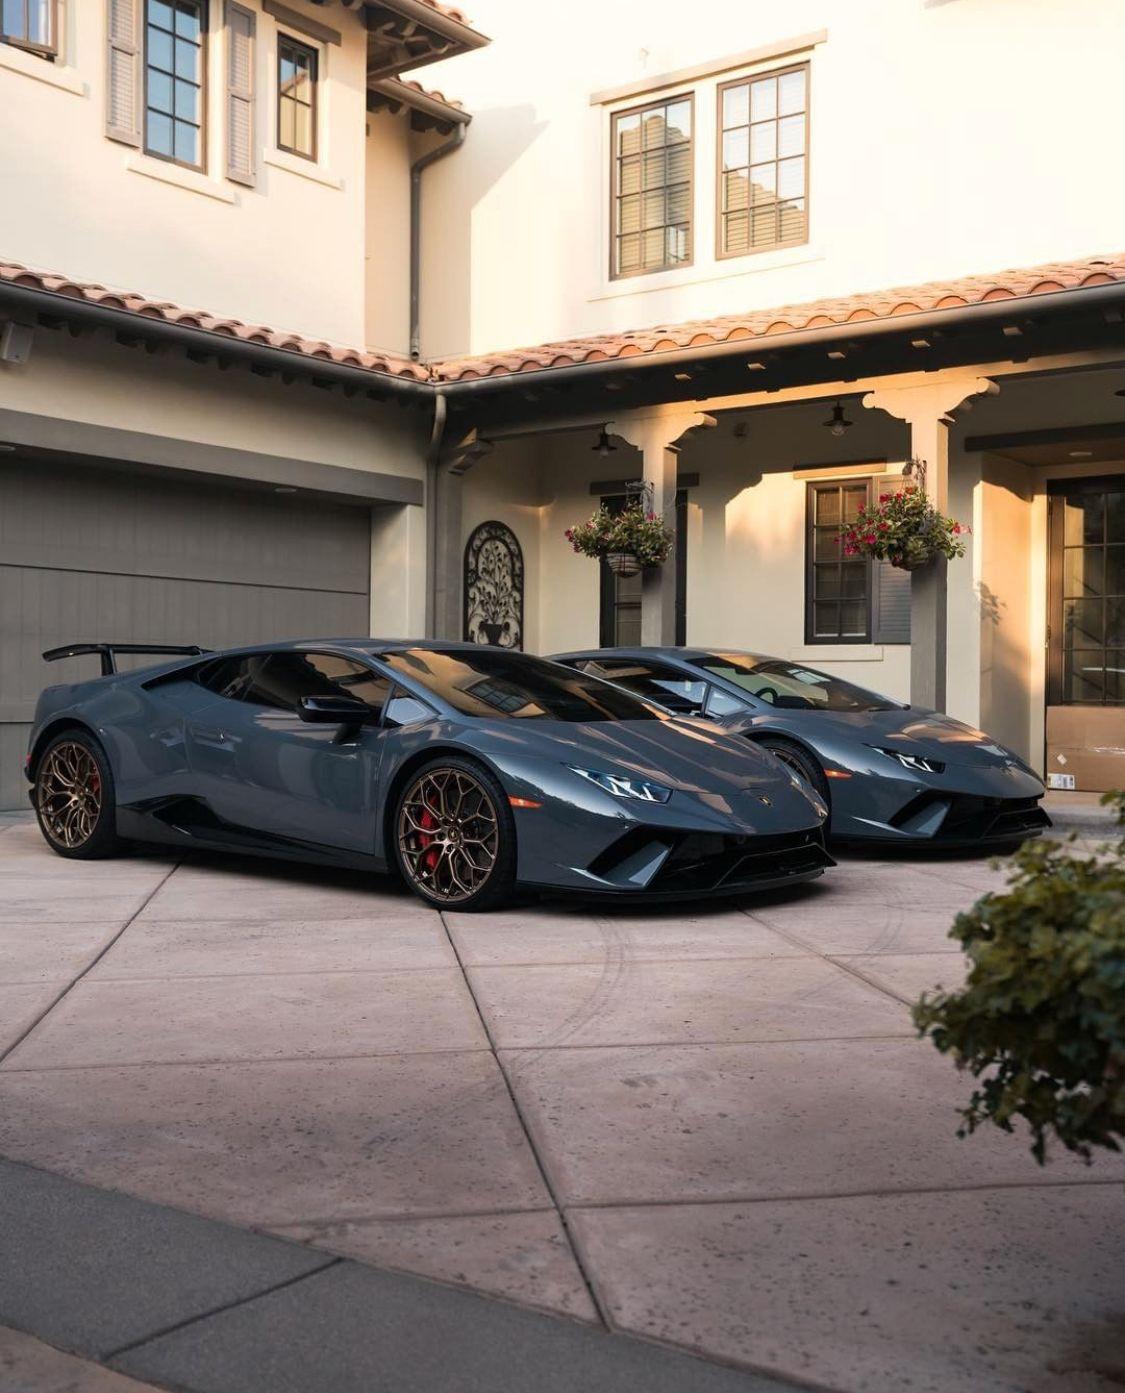 Pin By Nkululeko Mnikathi On My Life Luxury Cars Top Luxury Cars Super Cars